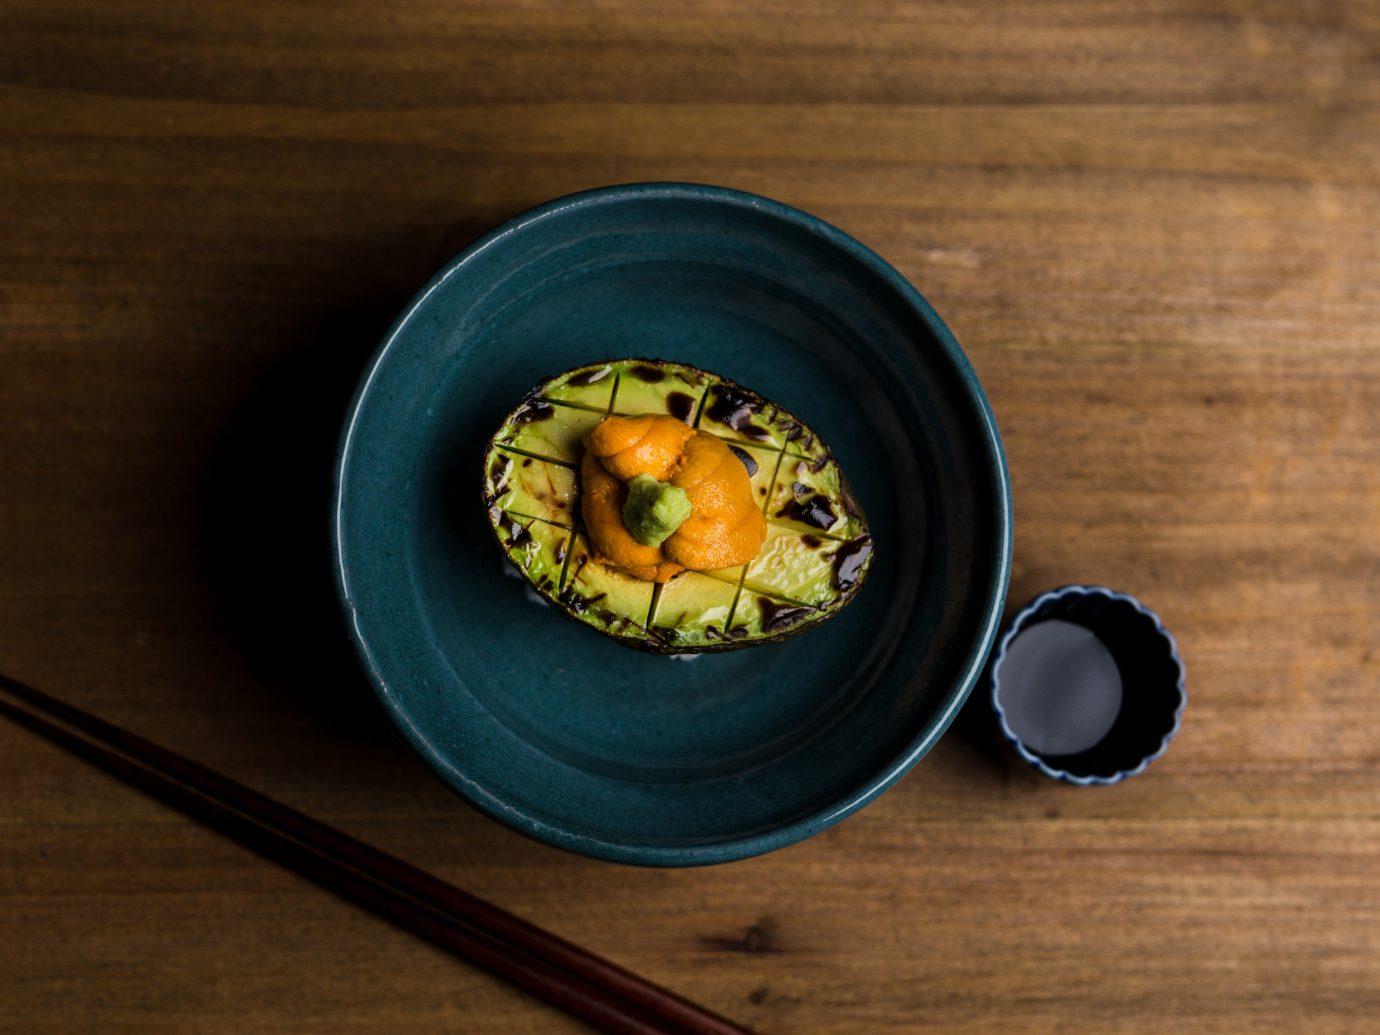 Food + Drink Girls Getaways Hotels Jetsetter Guides shopping Style + Design Weekend Getaways table floor wooden dish cuisine tableware meal recipe